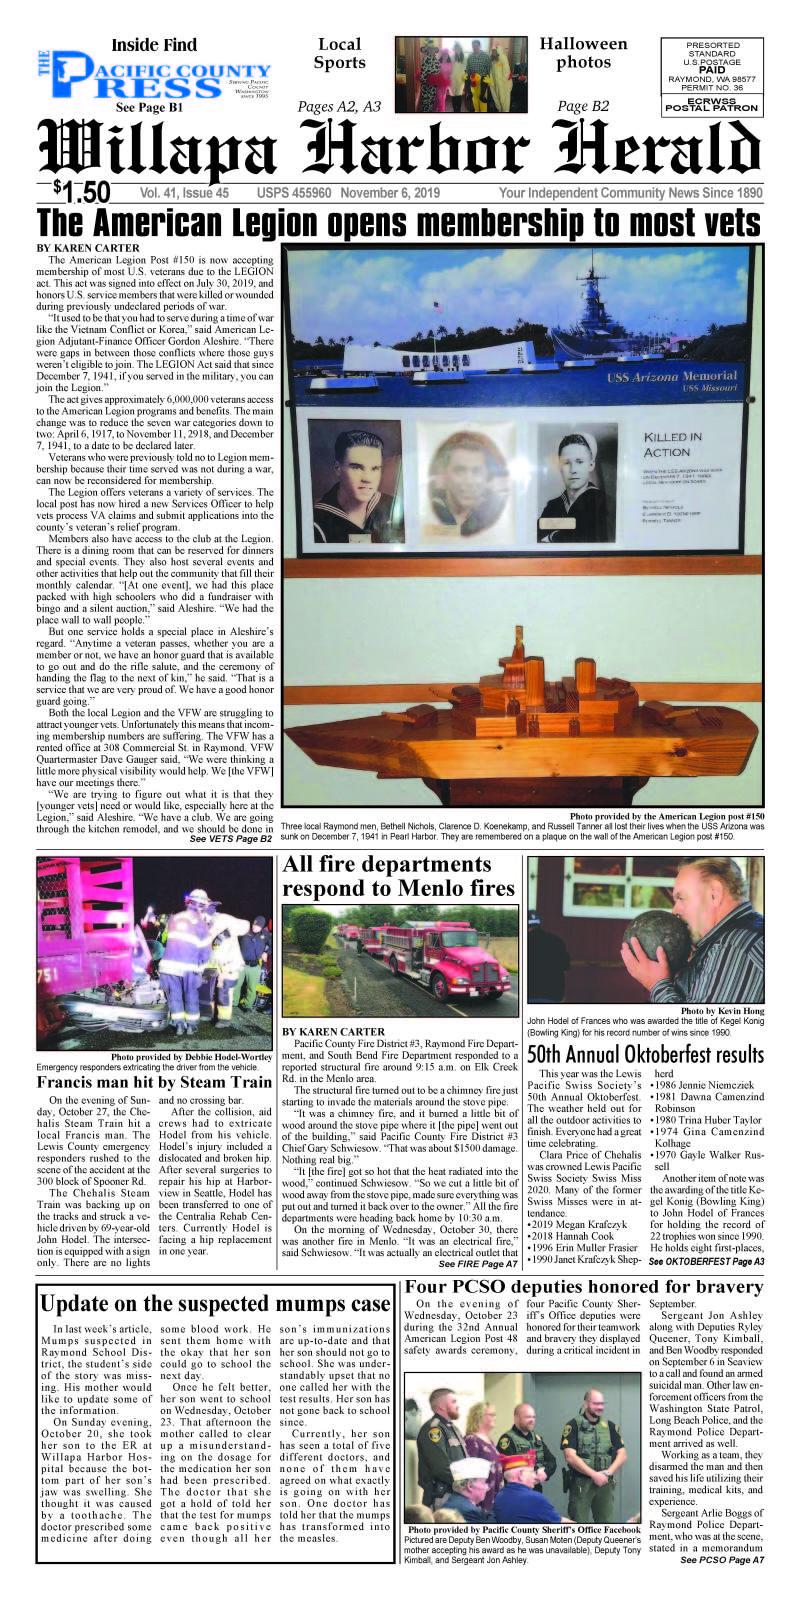 November 6, 2019 Willapa Harbor Herald and Pacific County Press